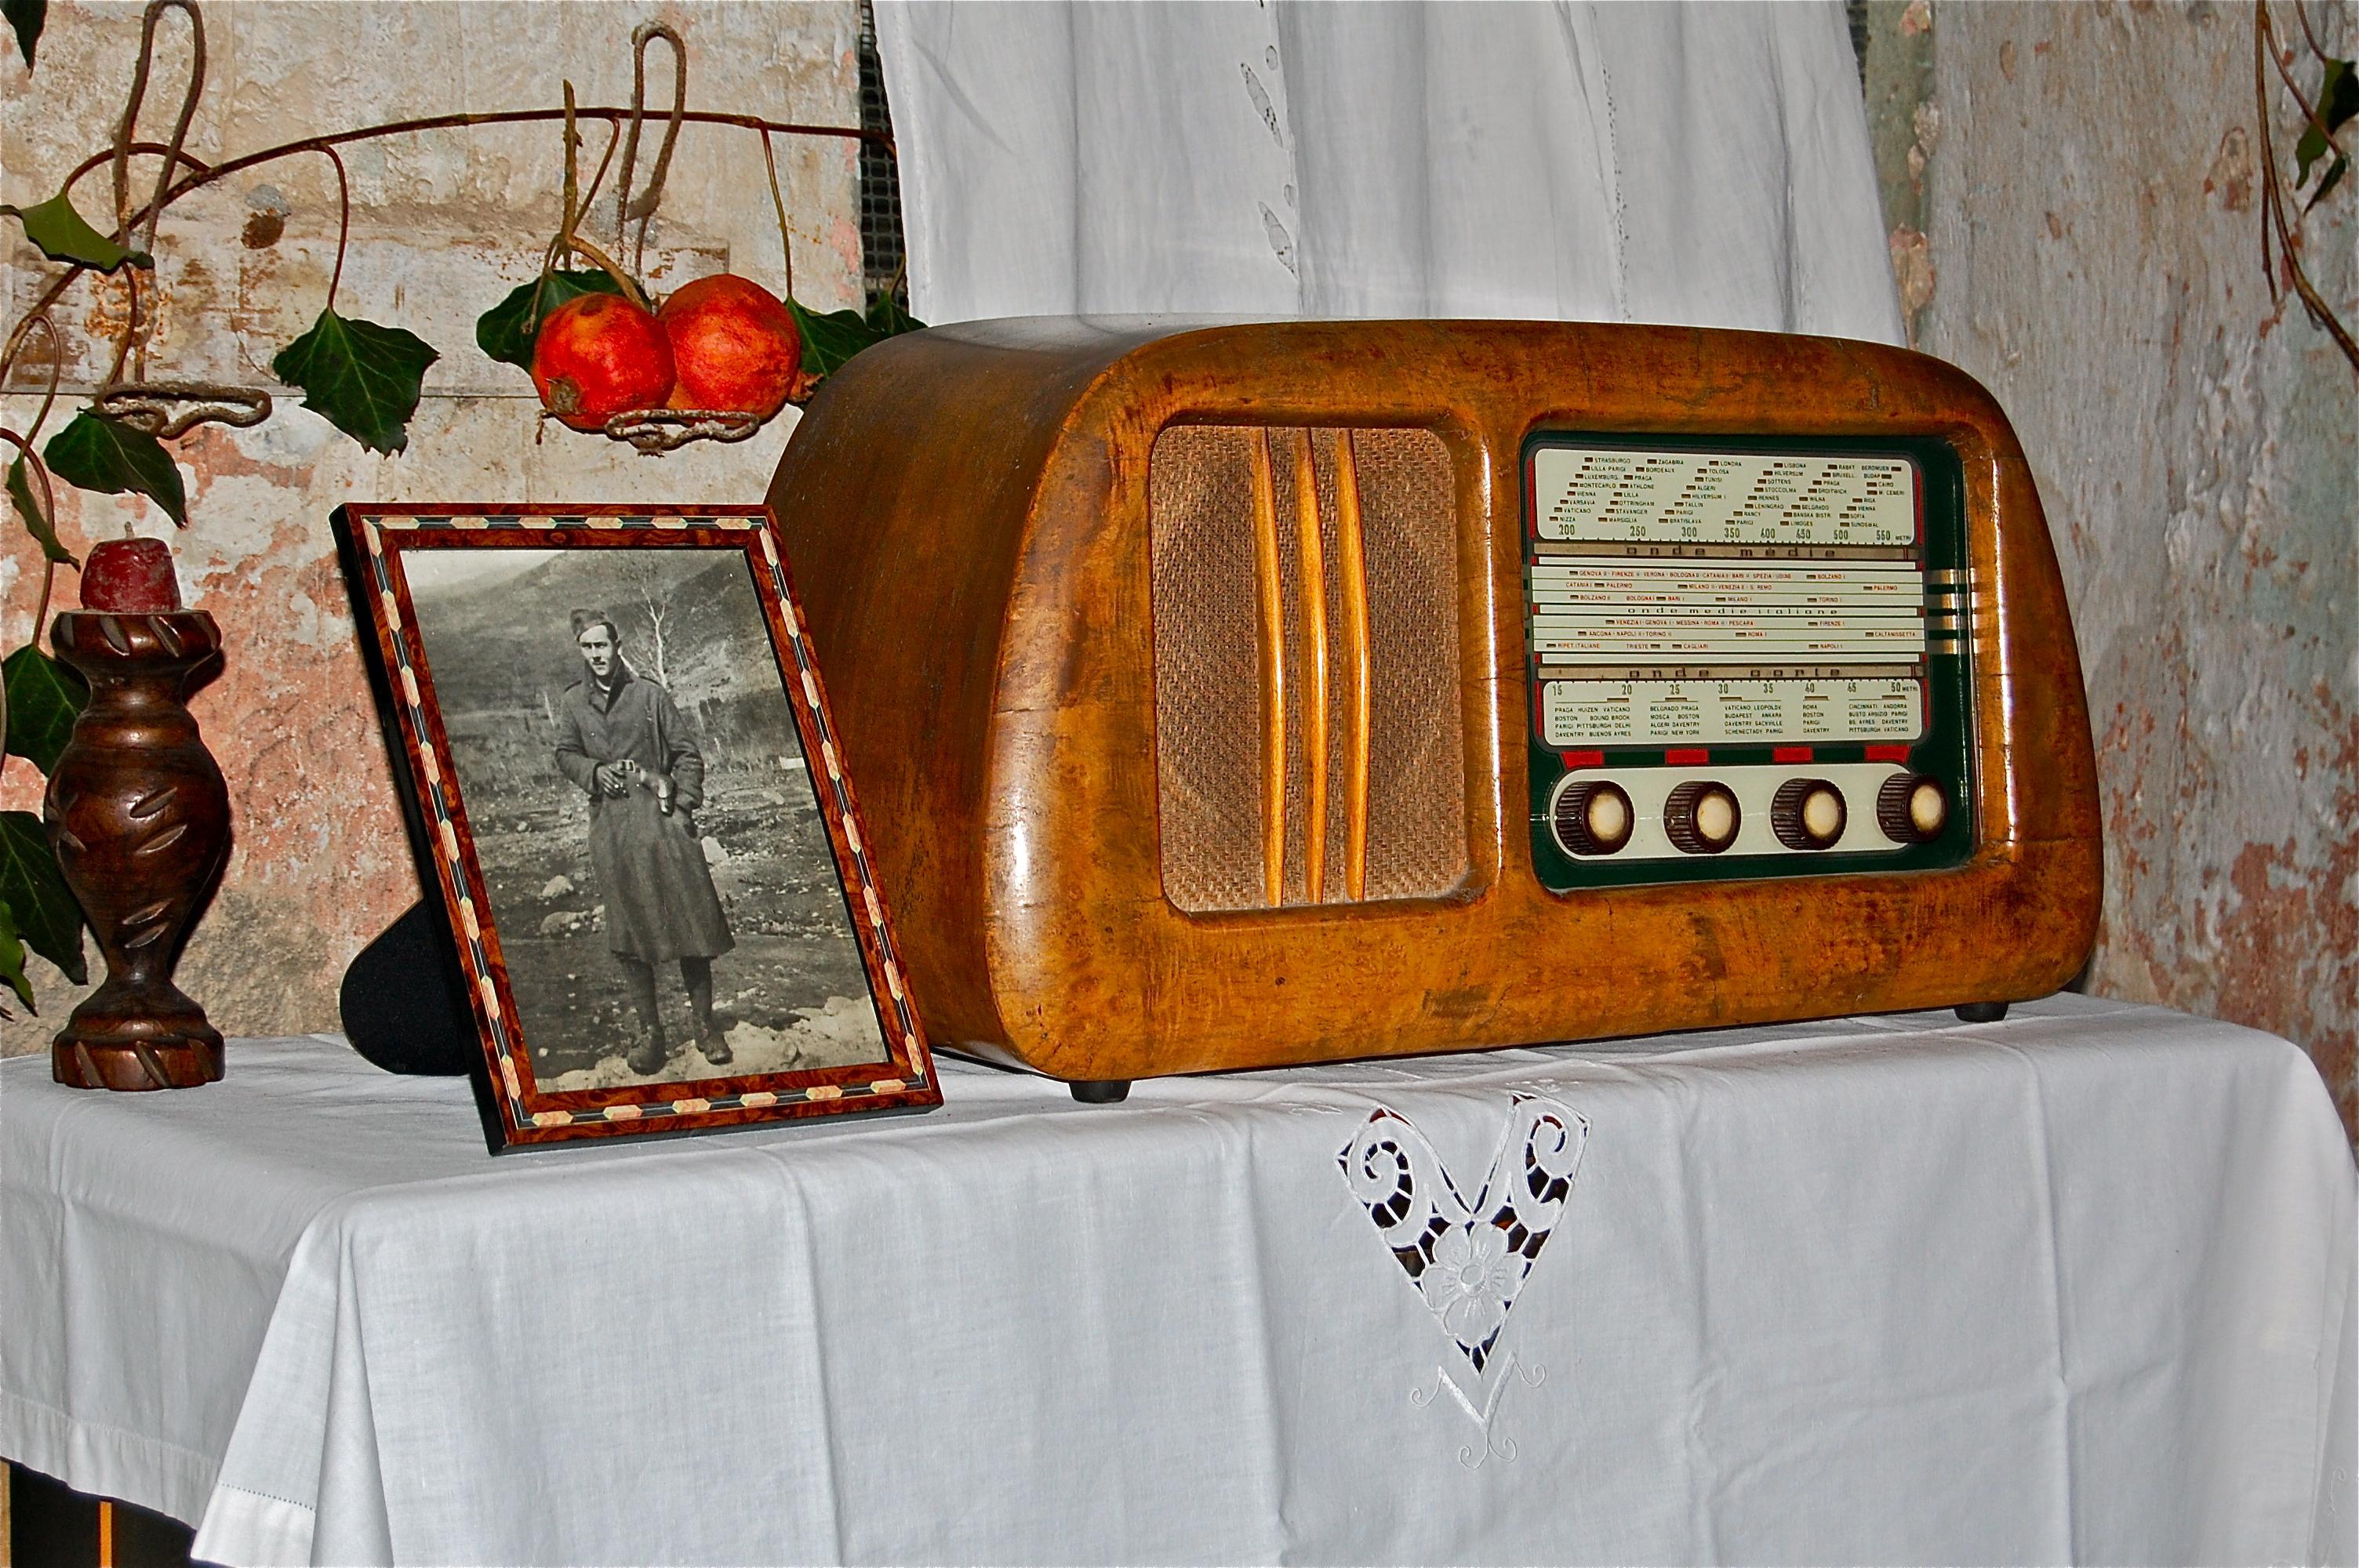 Radio Londra. Mozzanica (BG), Gennaio 2012